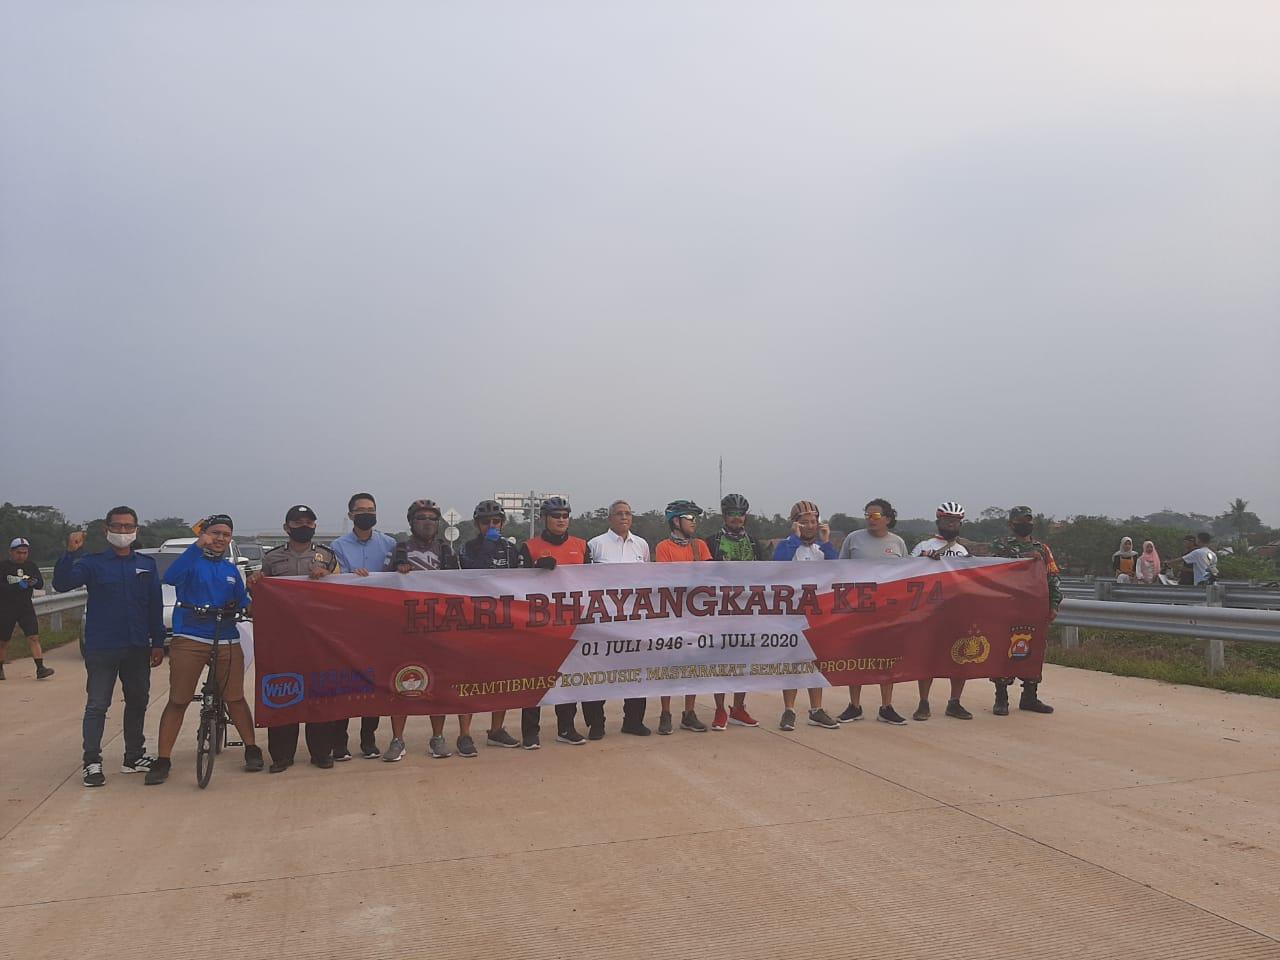 Ini Cara Komunitas Gowes Ucapkan HUT Bhayangkara